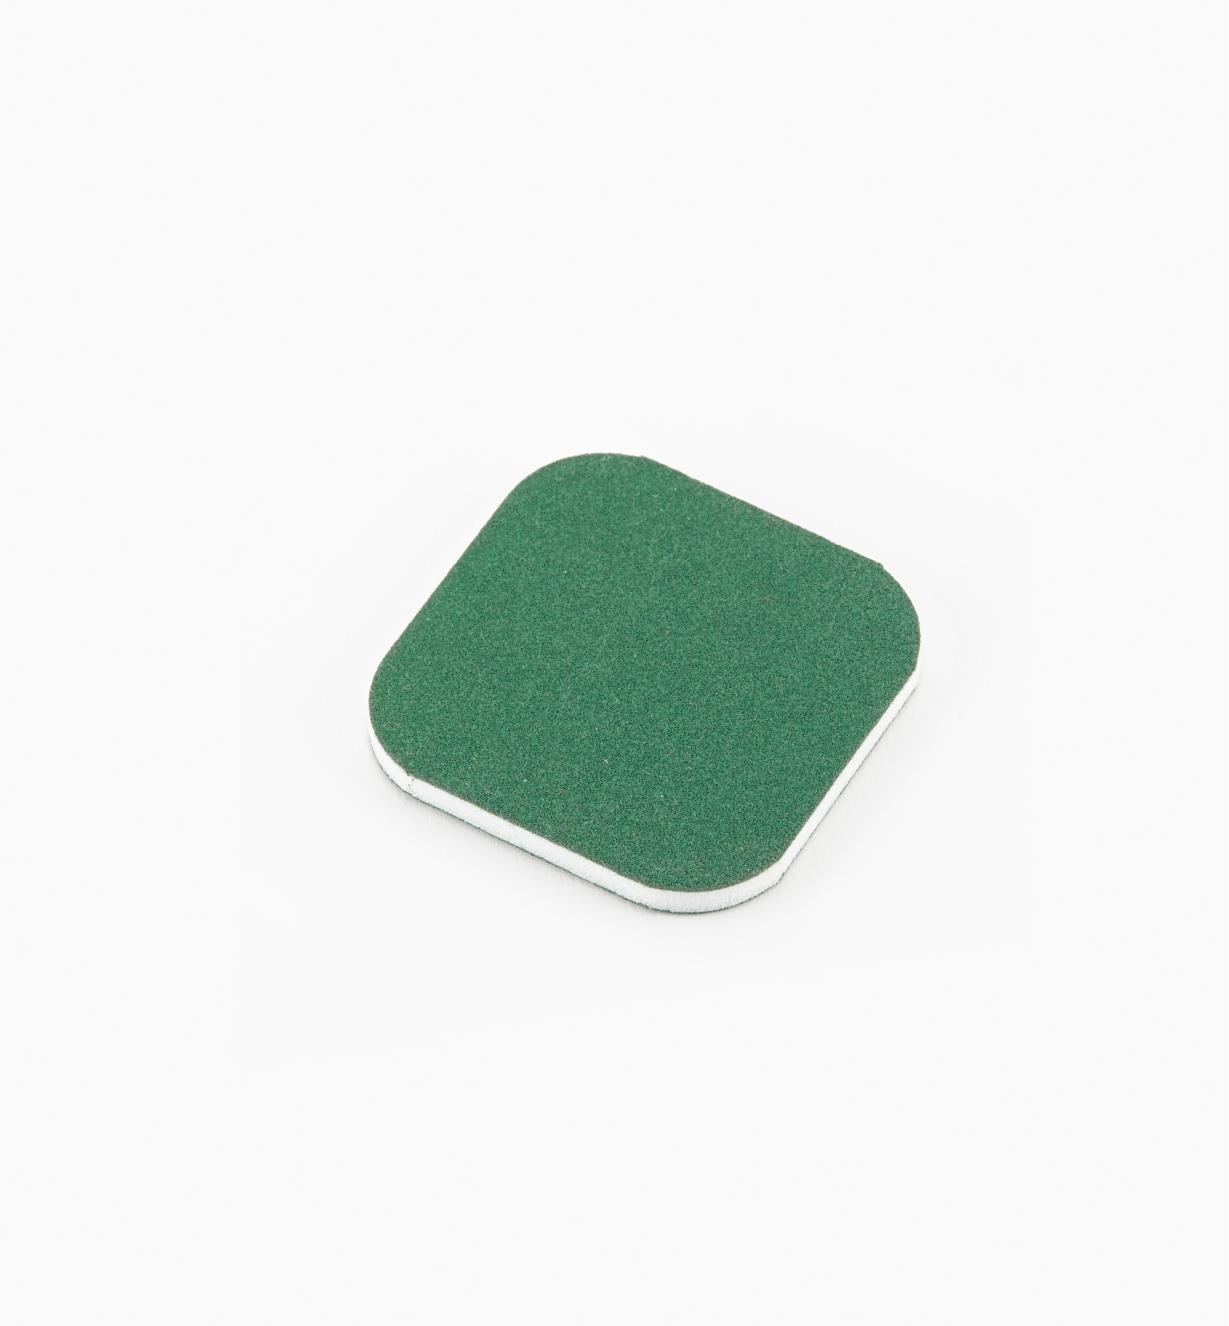 54K9011 - 1800x Micro-Mesh Pen-Sanding Pad, each